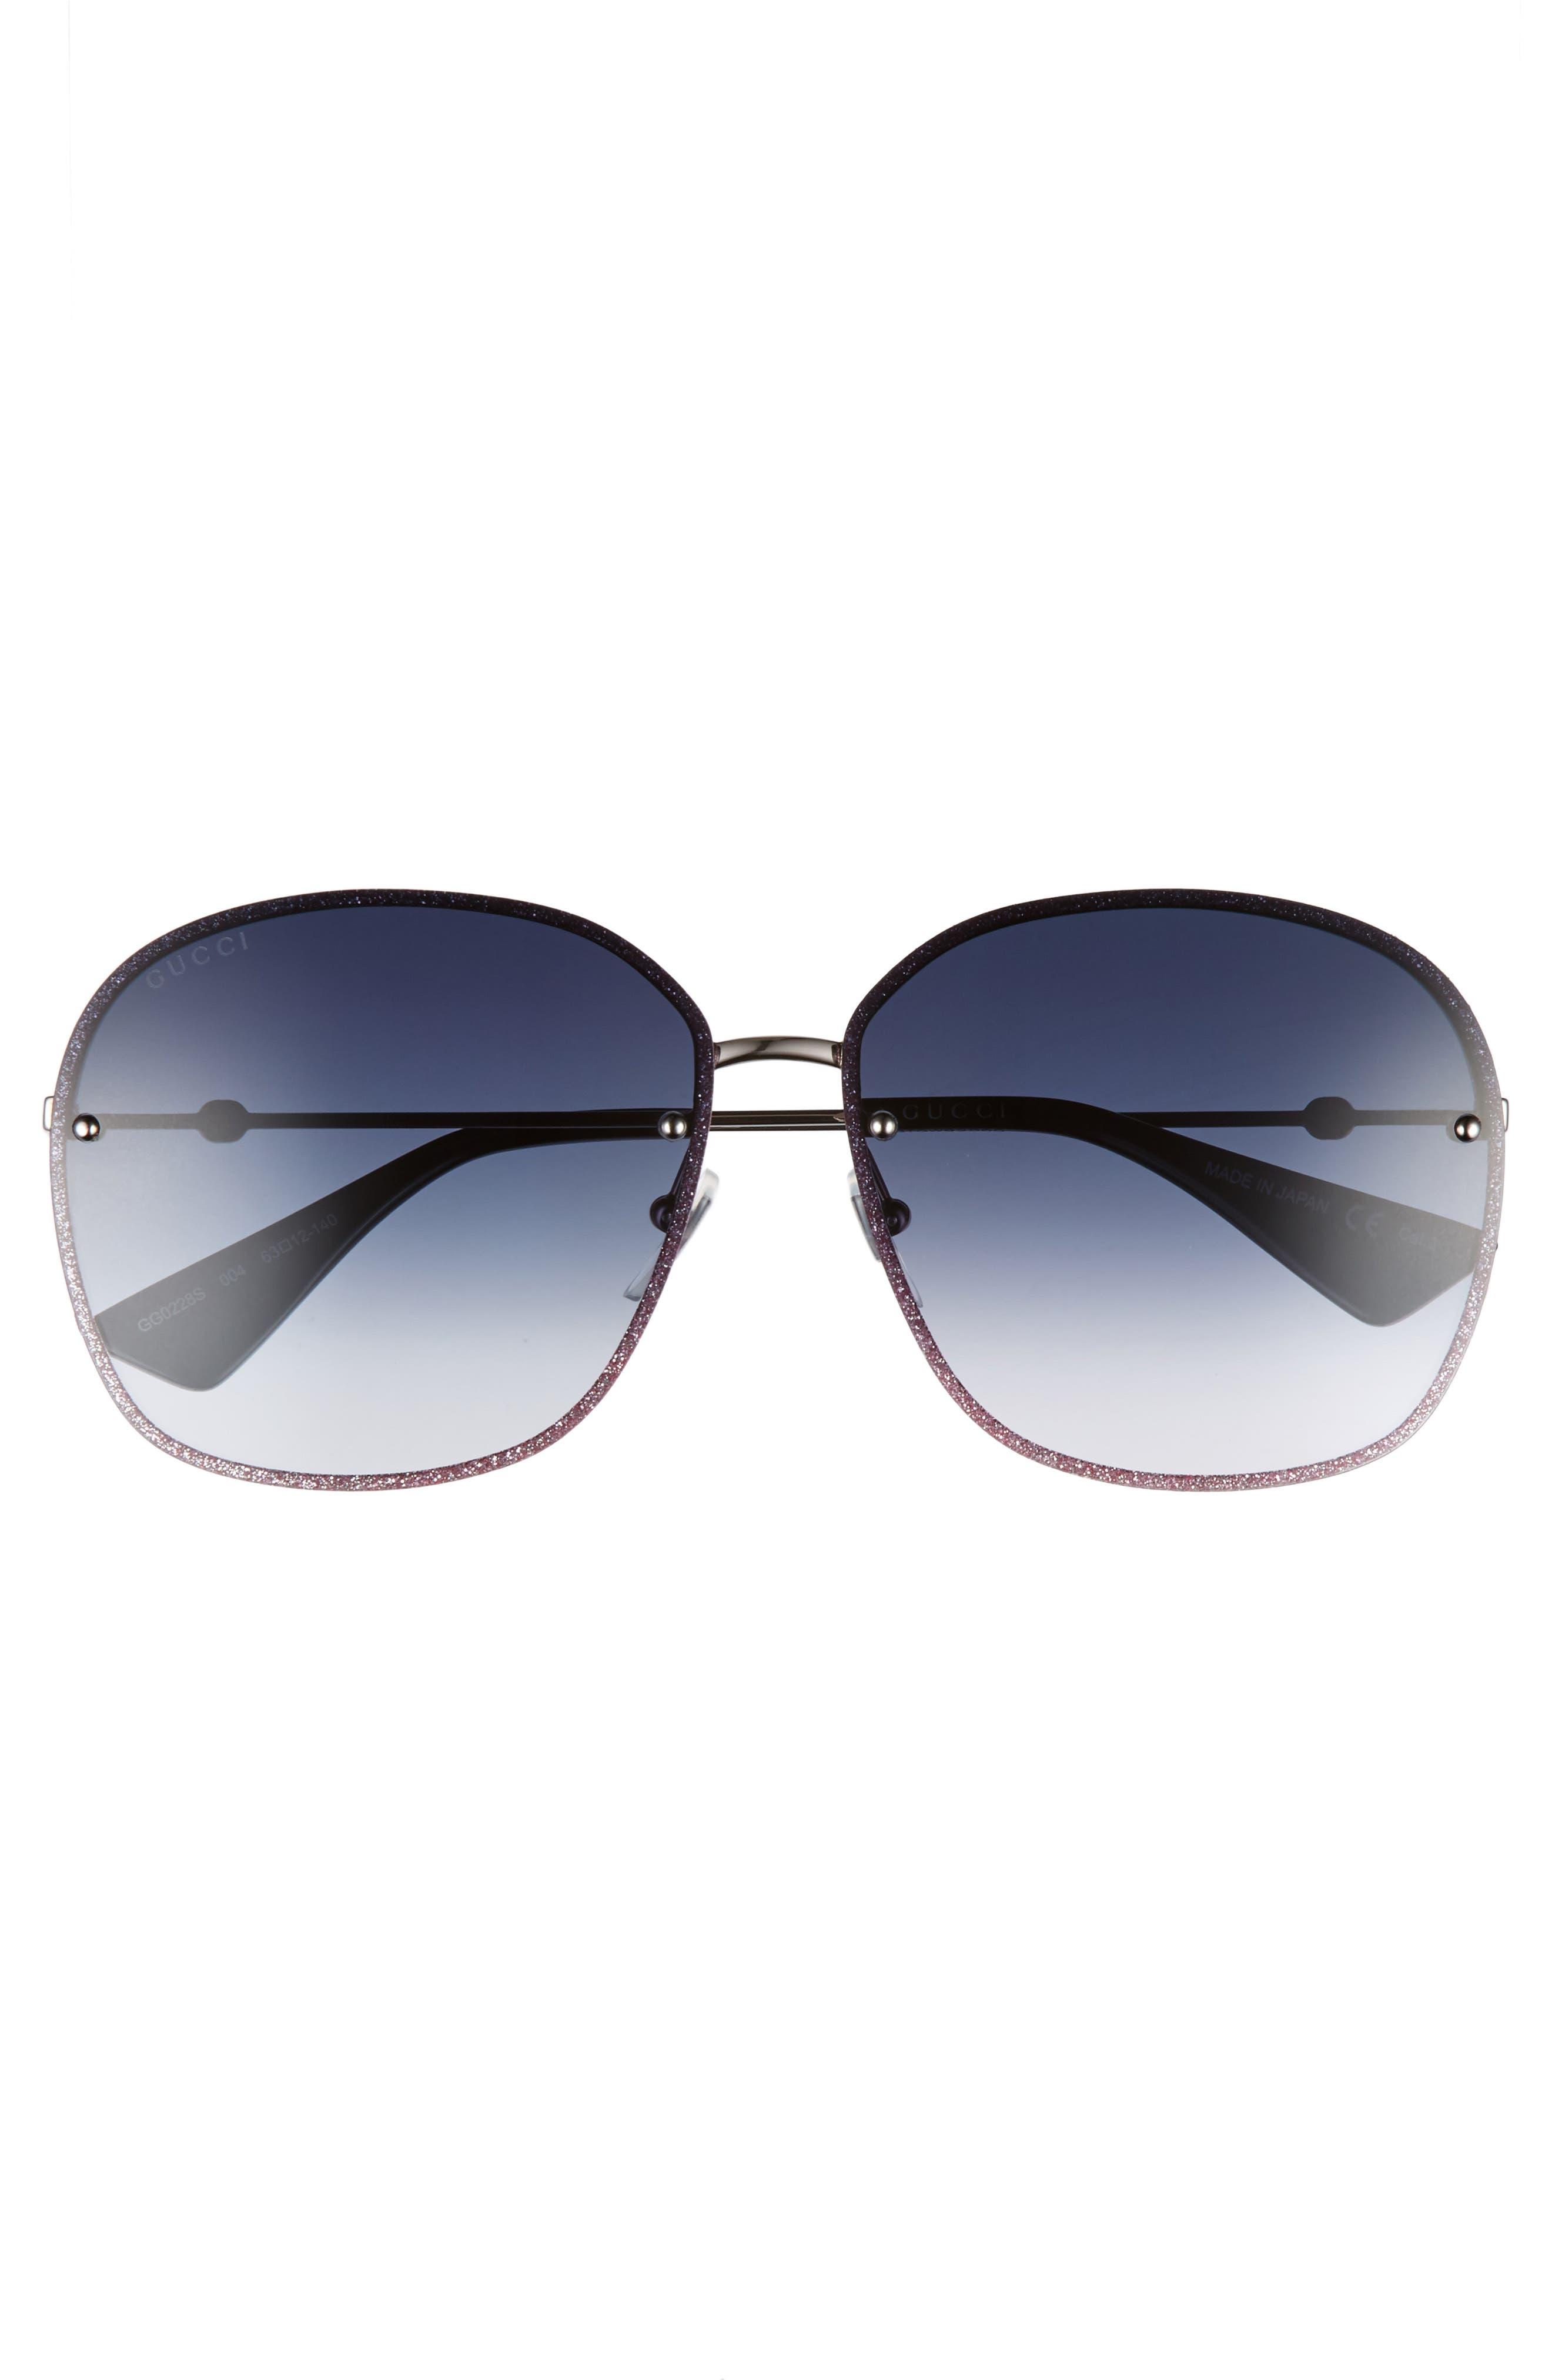 GUCCI,                             63mm Oversize Square Sunglasses,                             Alternate thumbnail 3, color,                             040